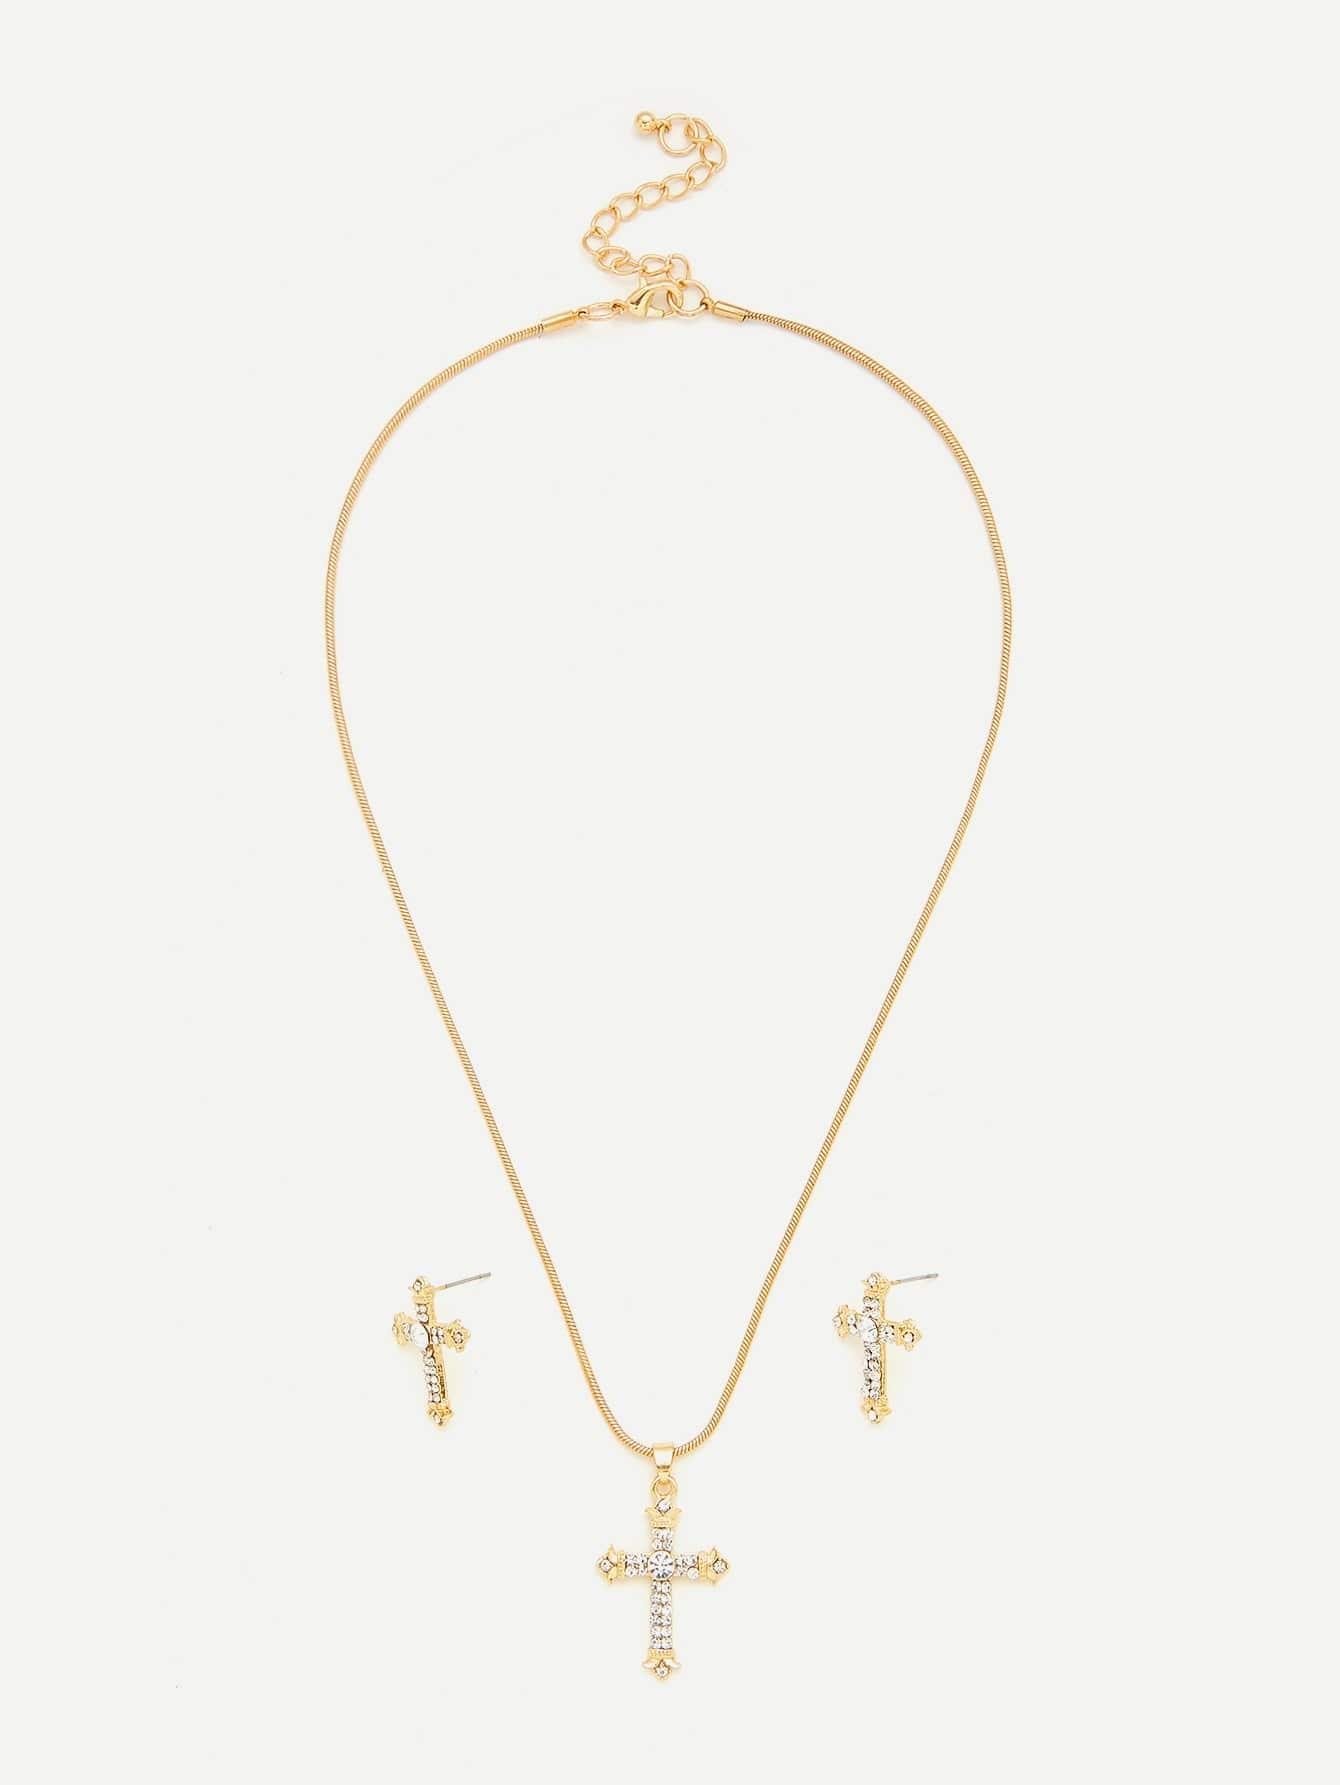 Rhinestone Cross Pendant Necklace With Earrings vintage rhinestone triangle pendant earrings